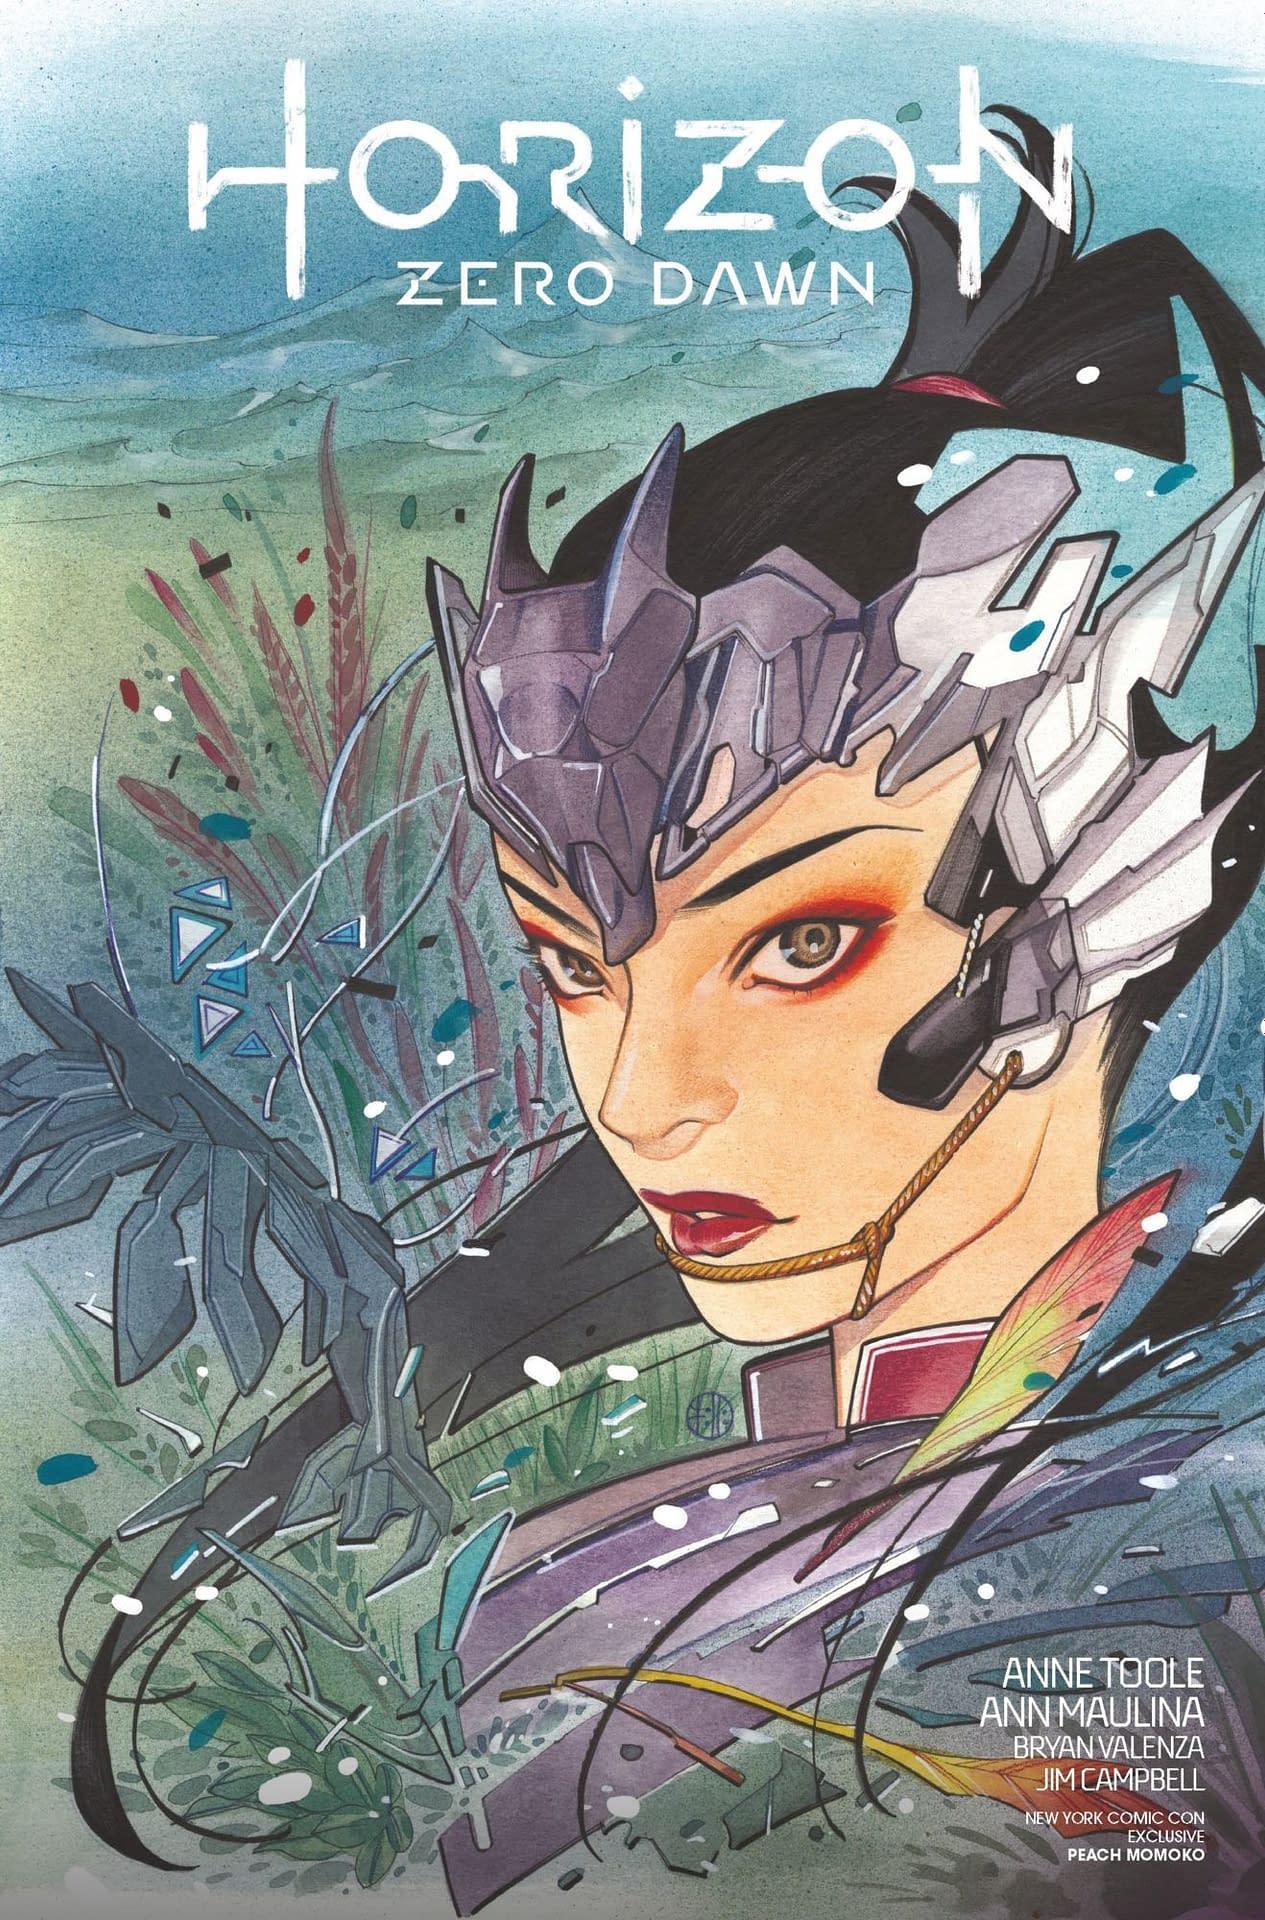 HORIZON ZERO DAWN #2 E FOC PEACH MOMOKO VARIANT COMIC BOOK BASED ON VIDEO GAME